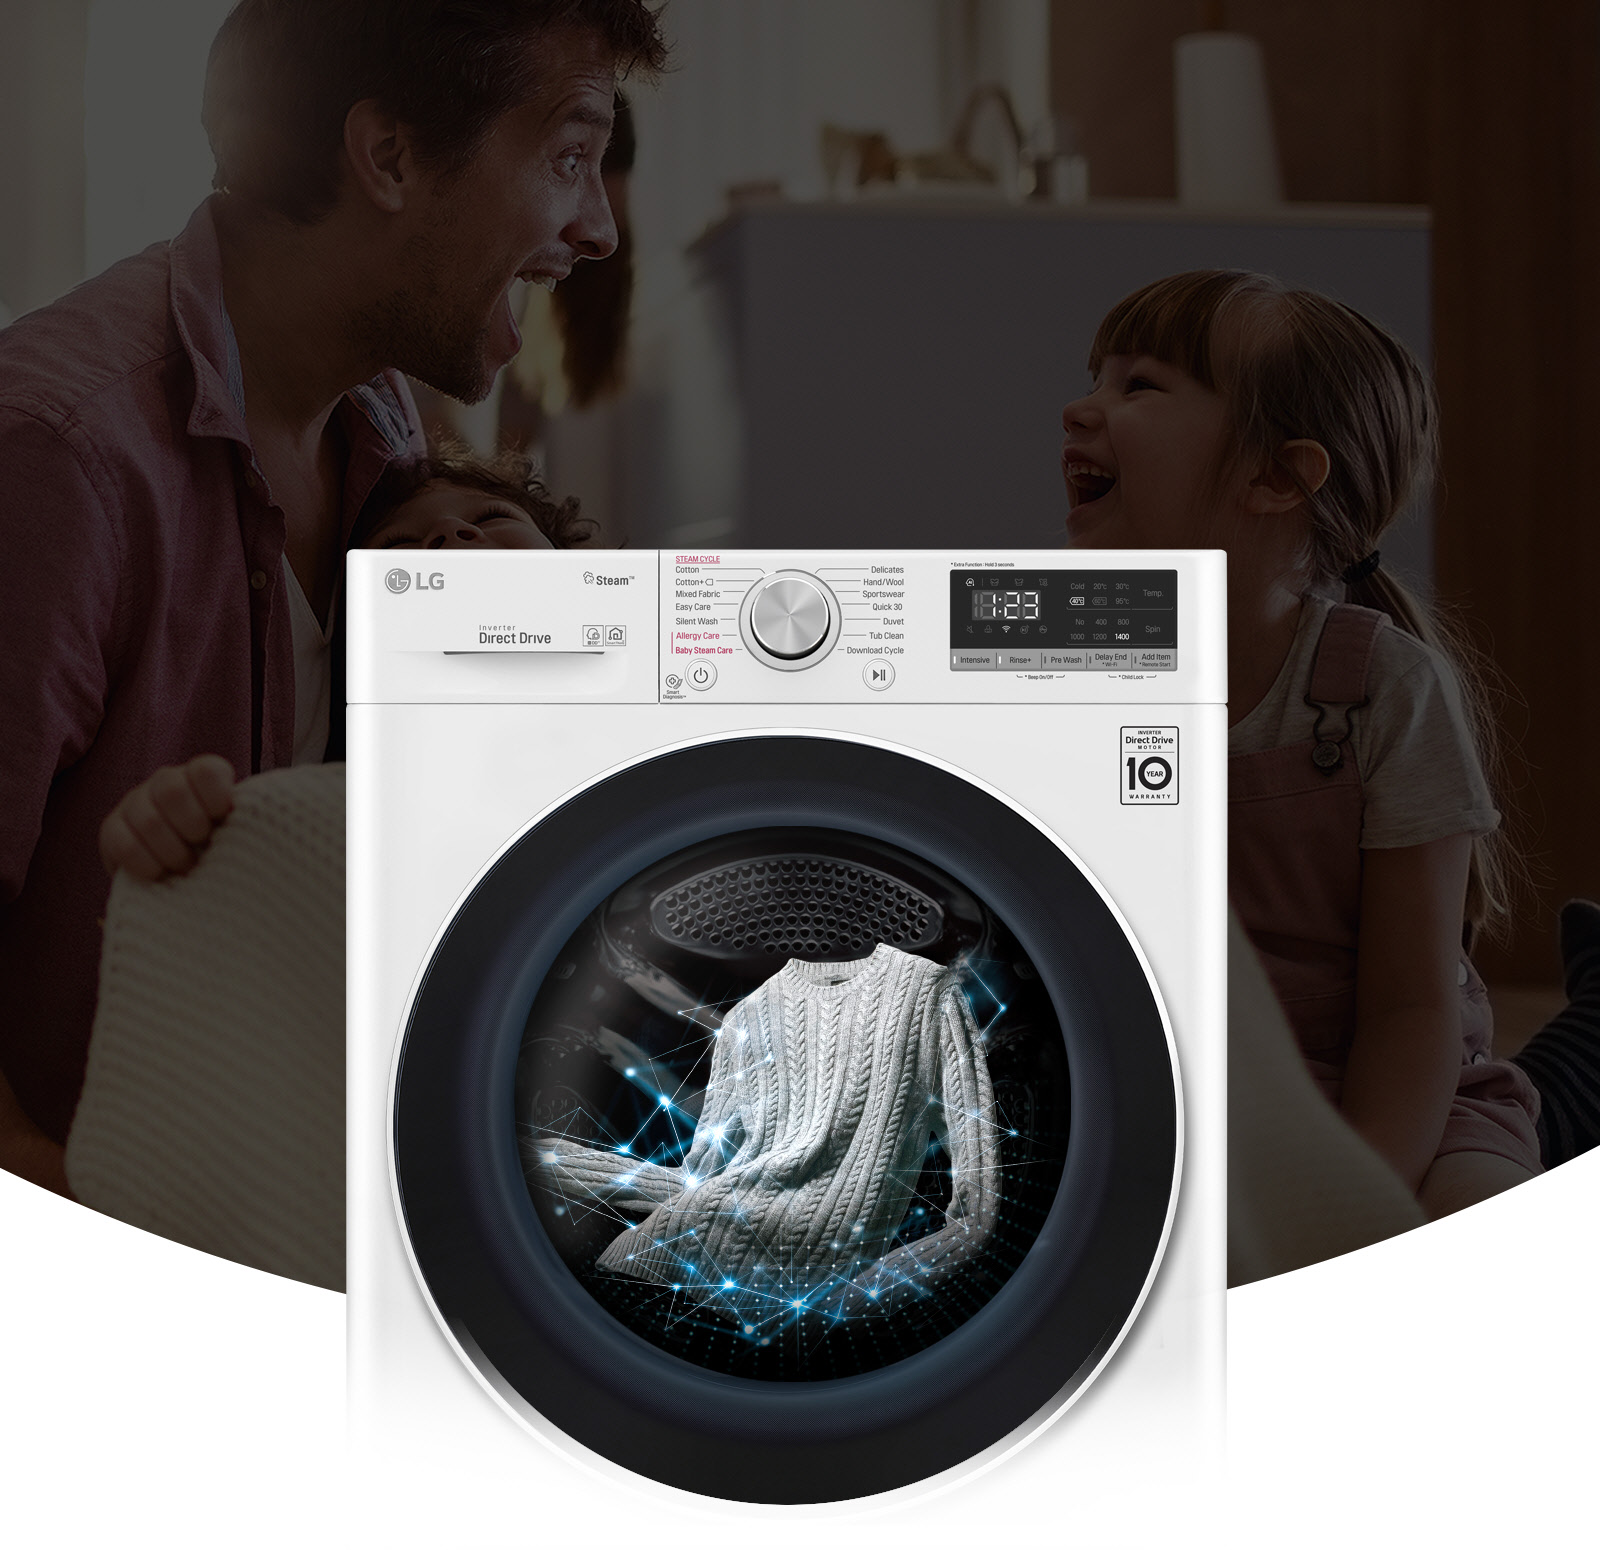 WM-Vivace-V400-C4R-White-01-1-Vivace-Intro-Desktop